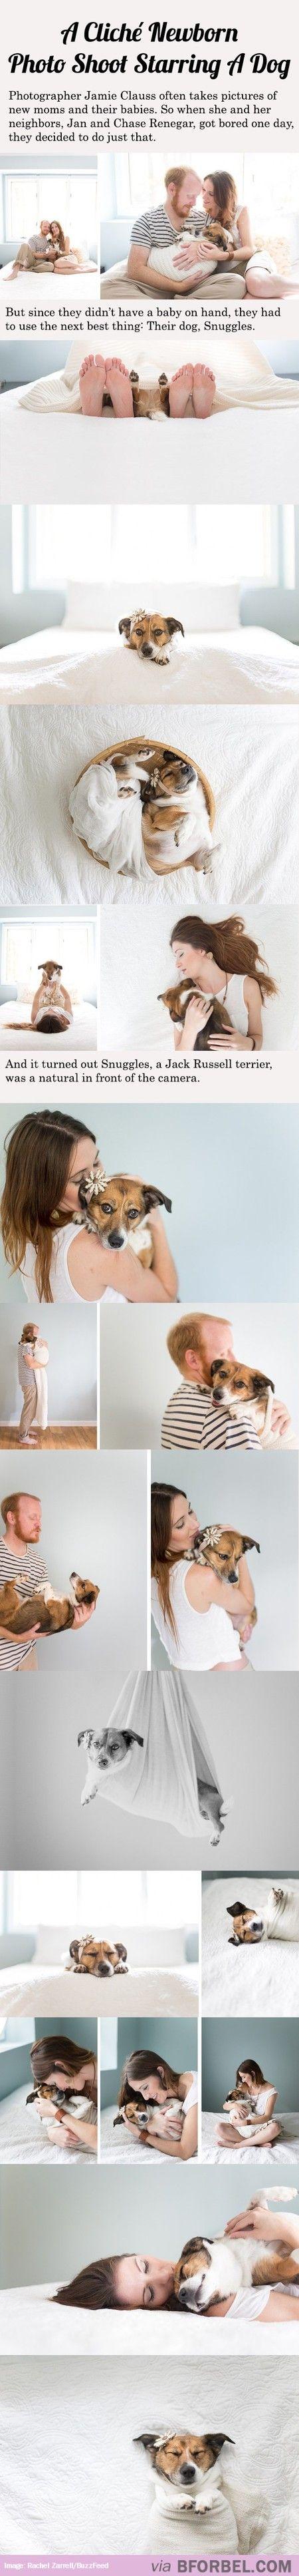 20 Cliche New Born Photos Starring A Dog…